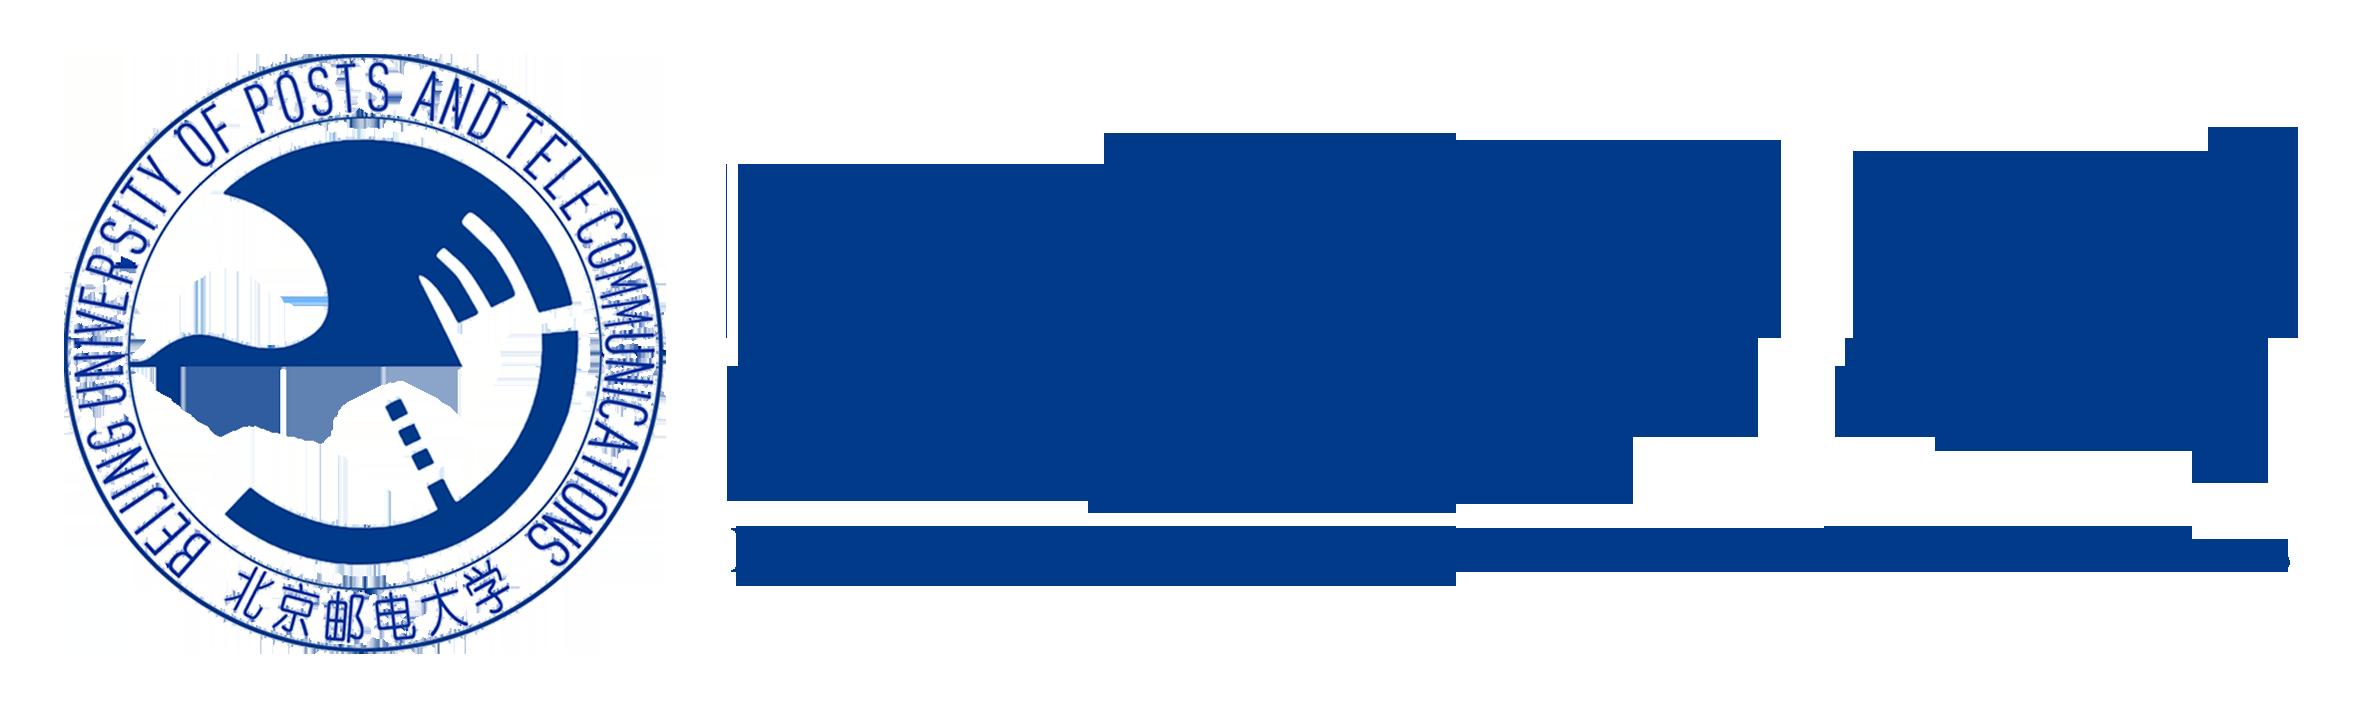 BUPT_logo.png